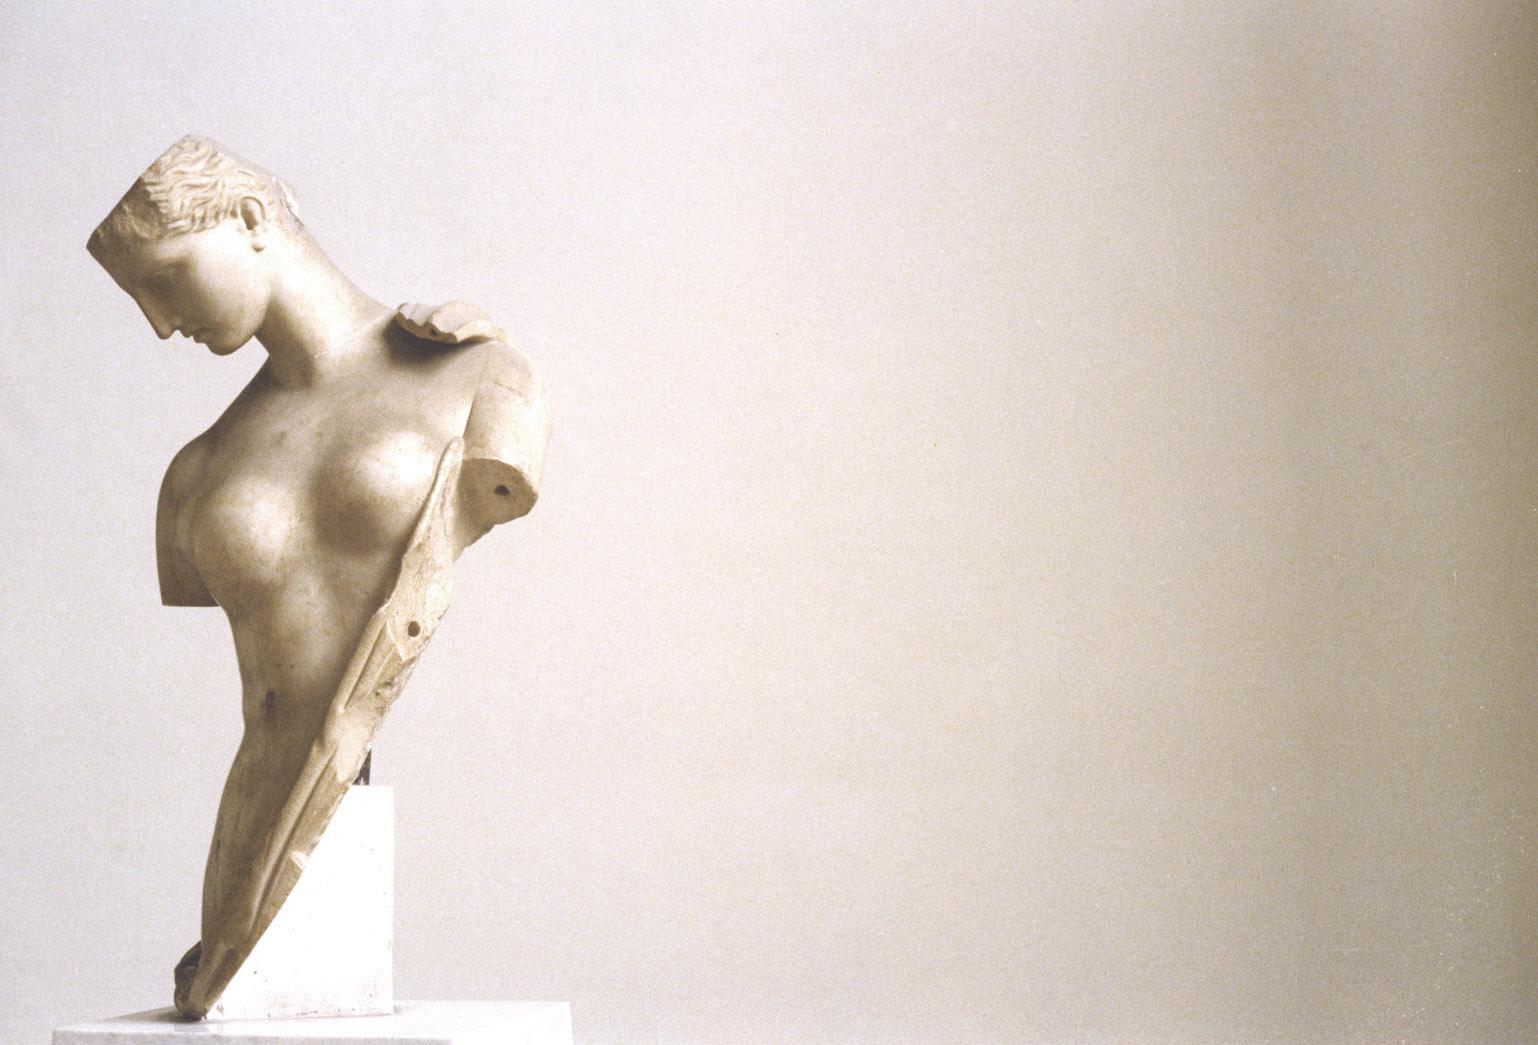 Luigi Ghirri,  Napoli, 1980, da   Paesaggio Italiano,   tiratura 4/5-5/5, 60x 80 cm, tiratura 10/10 , cm 40x50, stampa  cromogenica